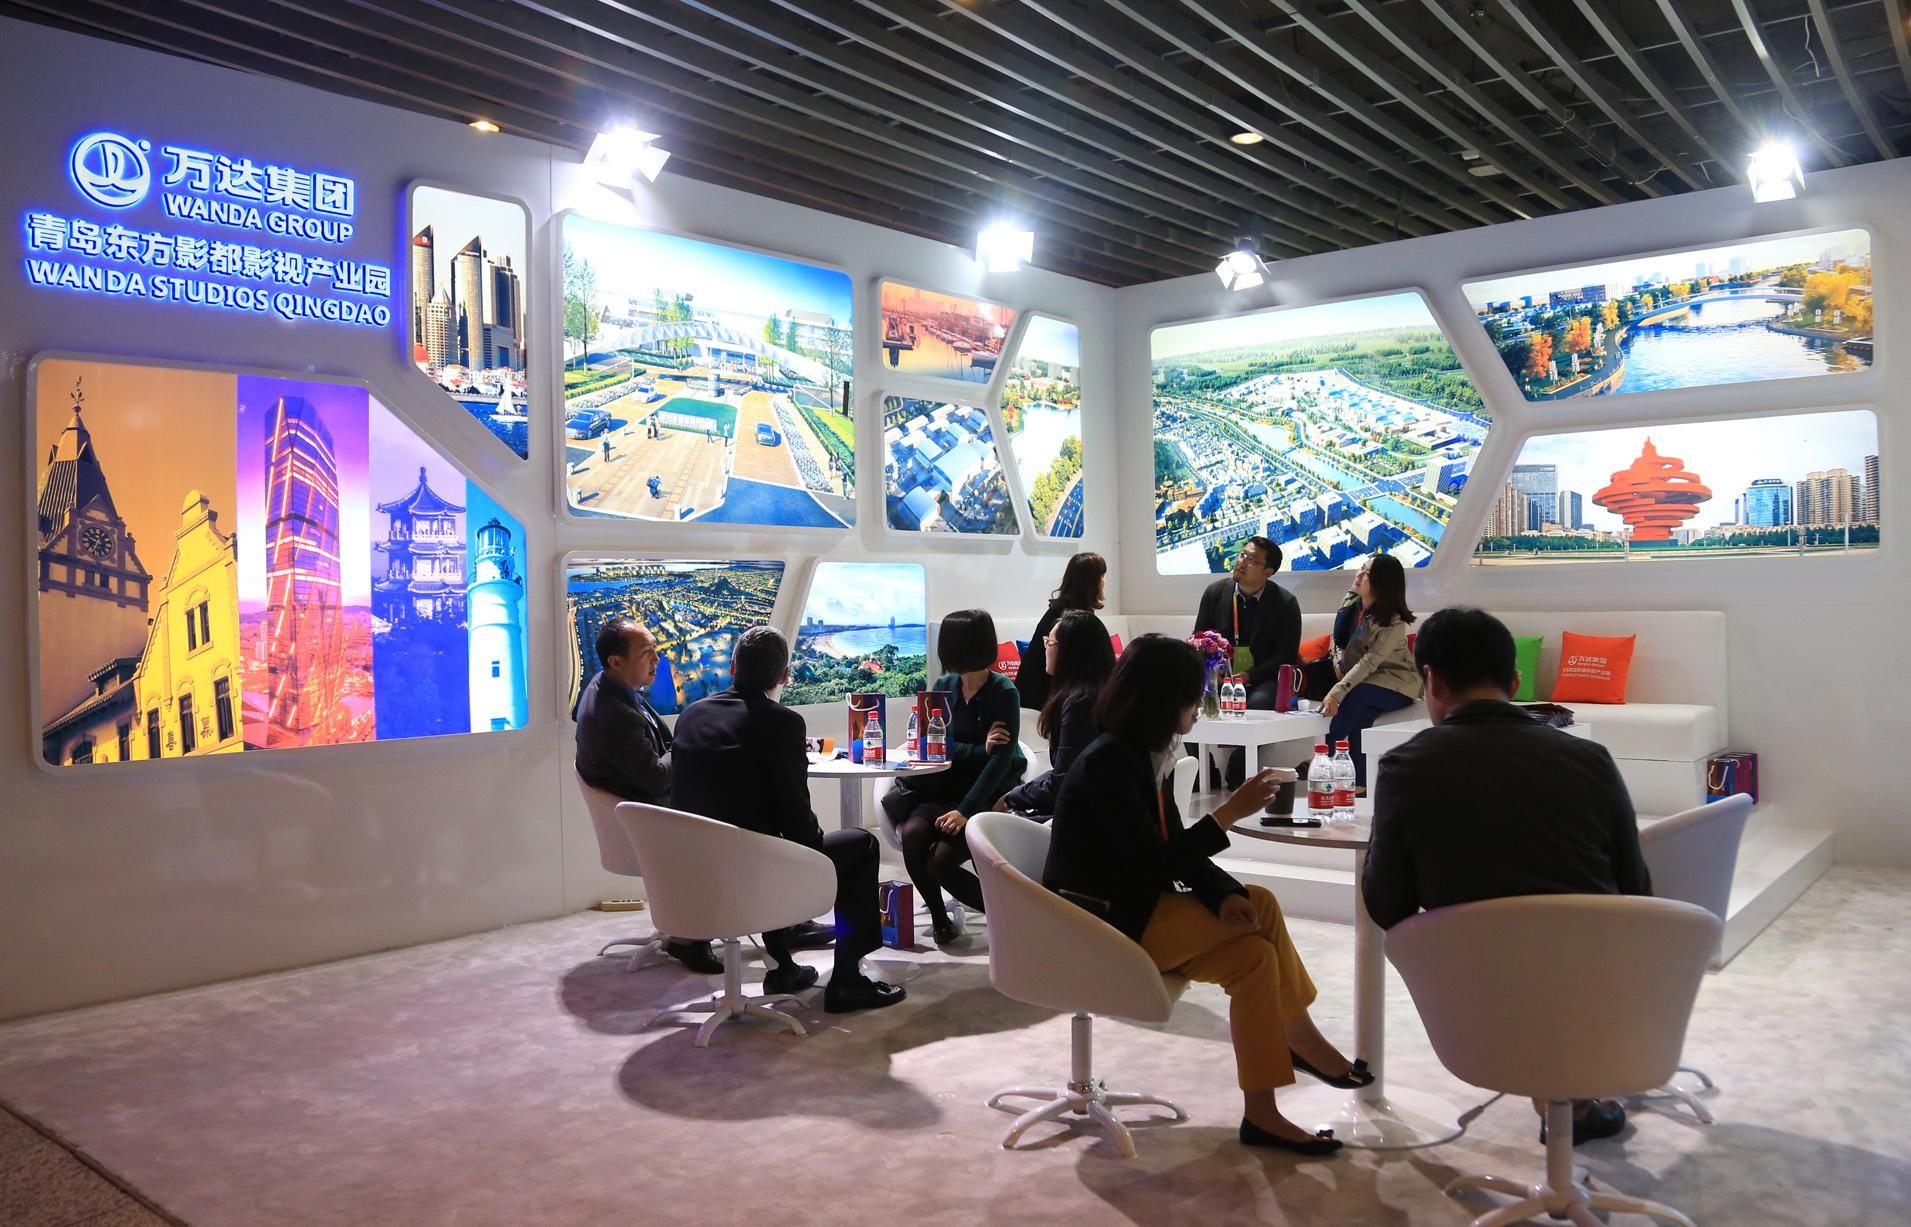 Wanda Studios Qingdao Showcased at 5th Beijing International Film Festival